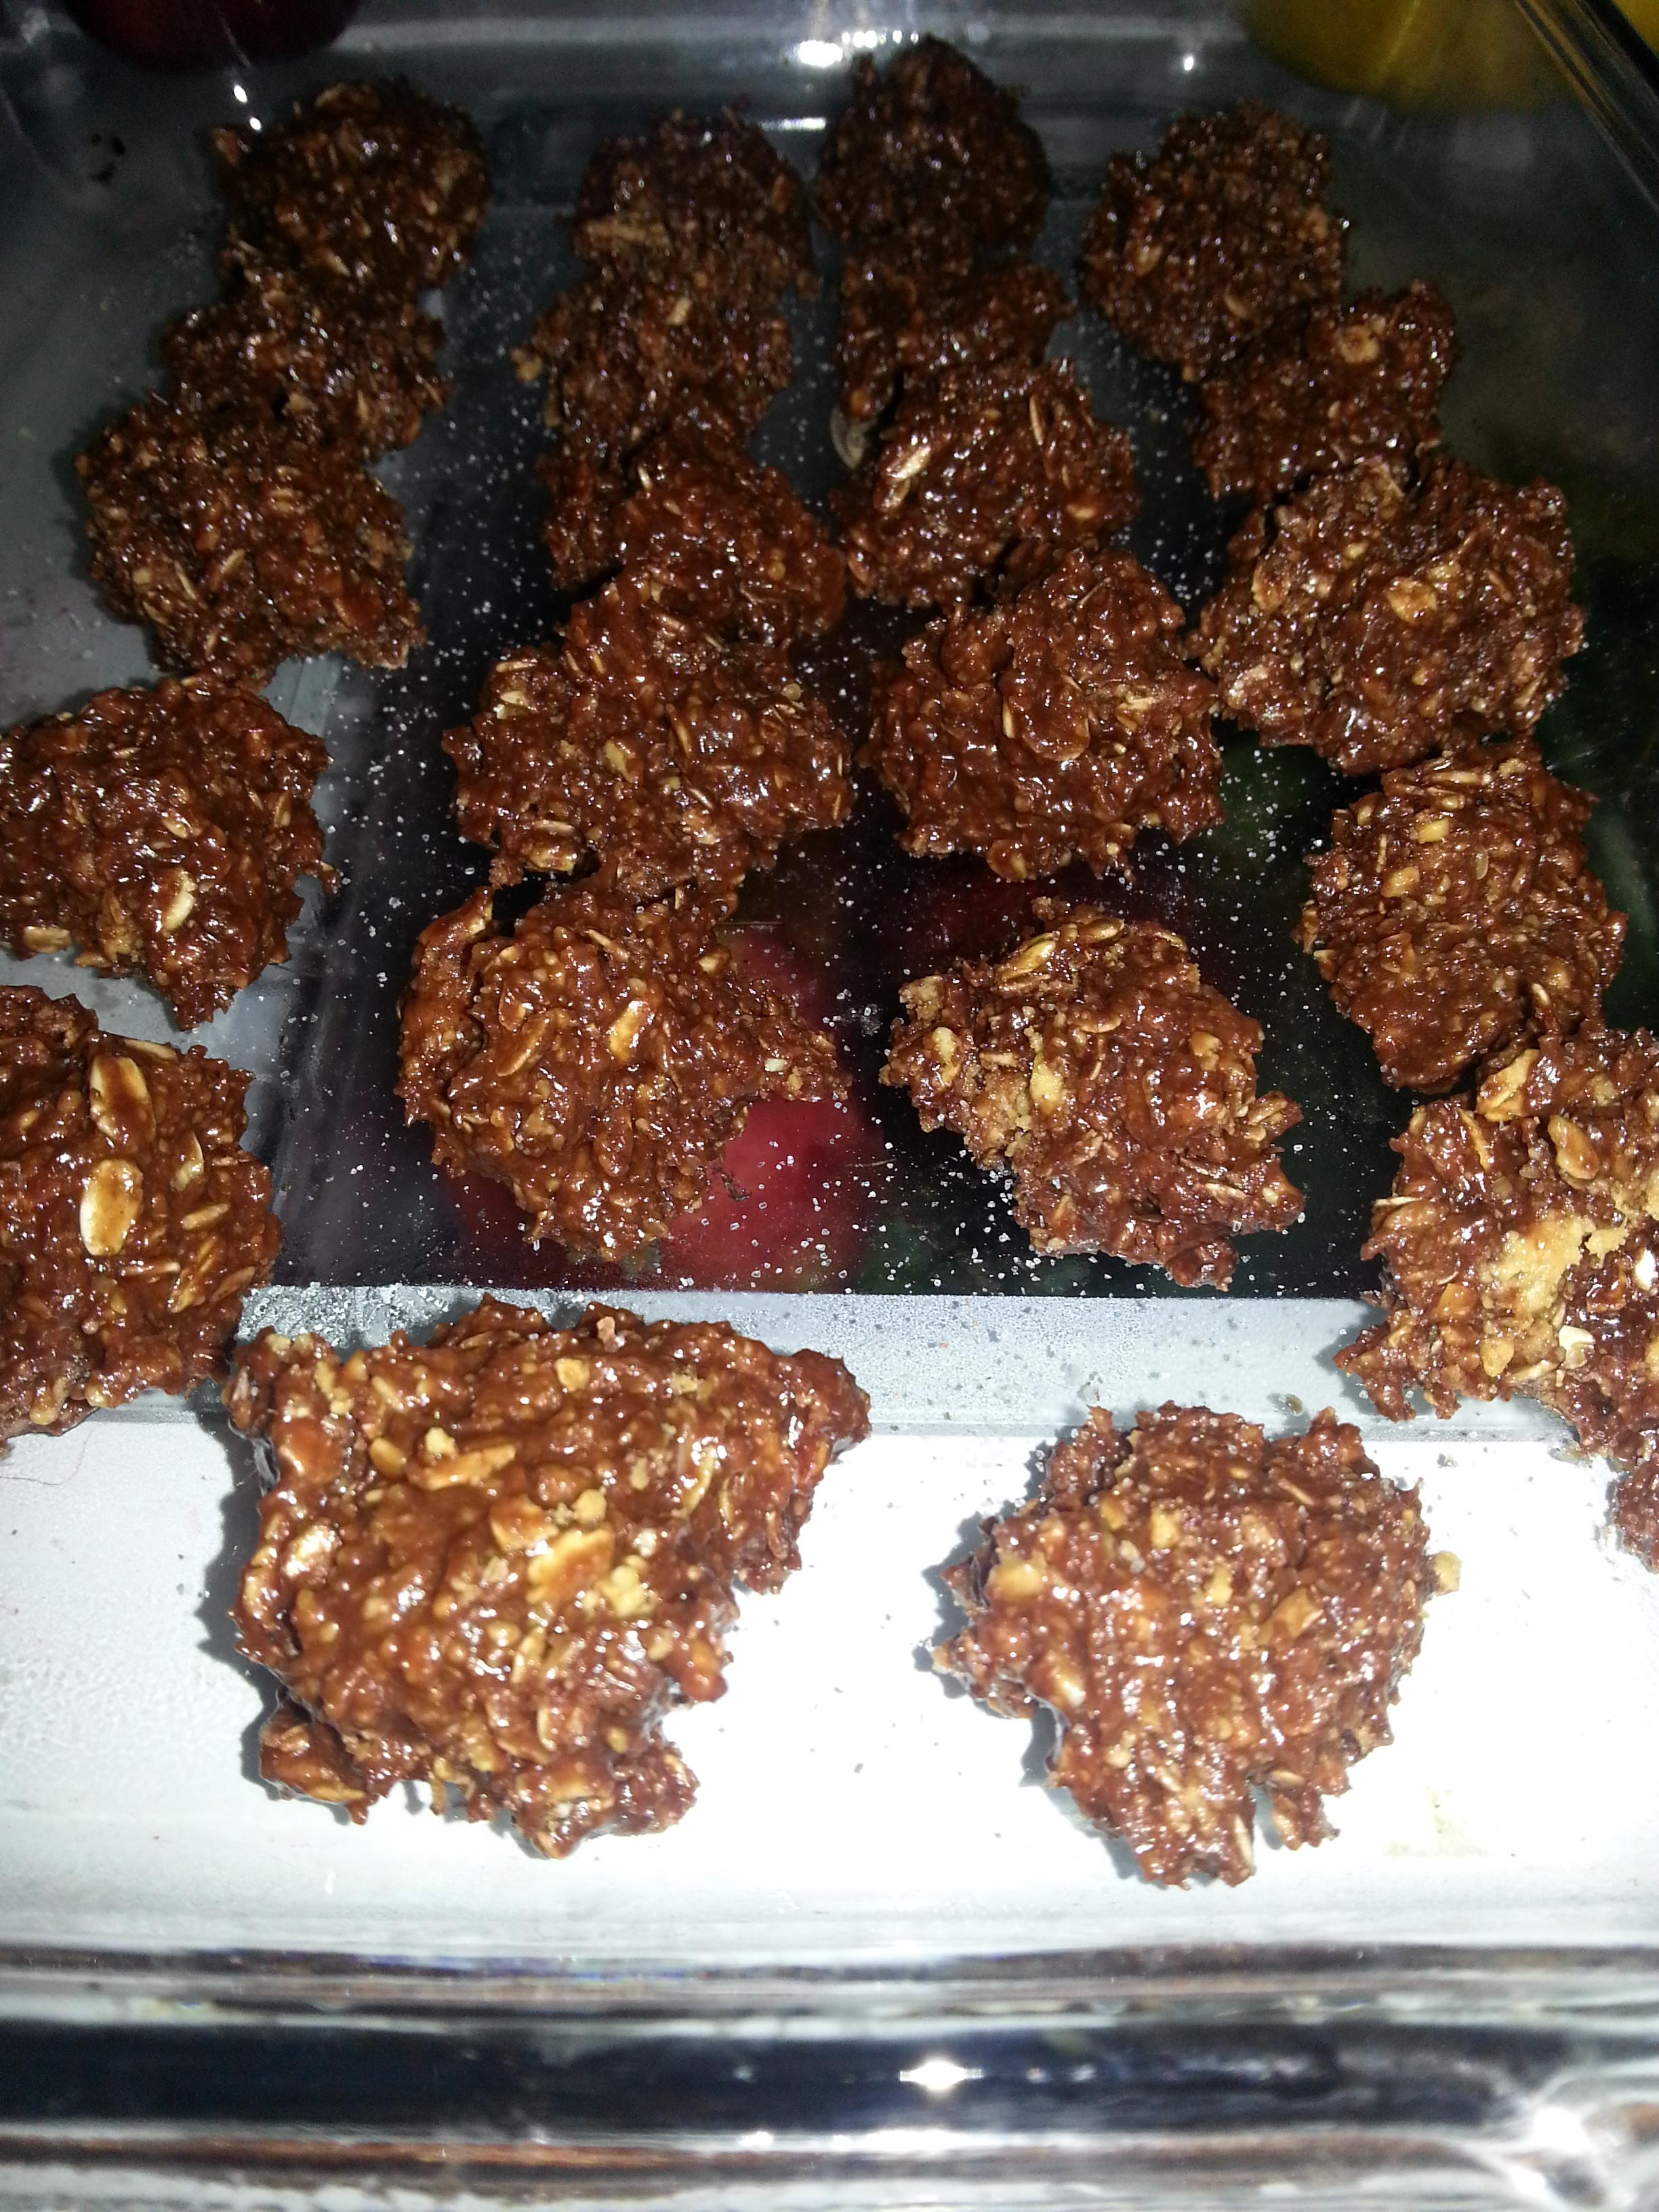 Chef's Chocolate Salty Balls | Evolve My Life ™